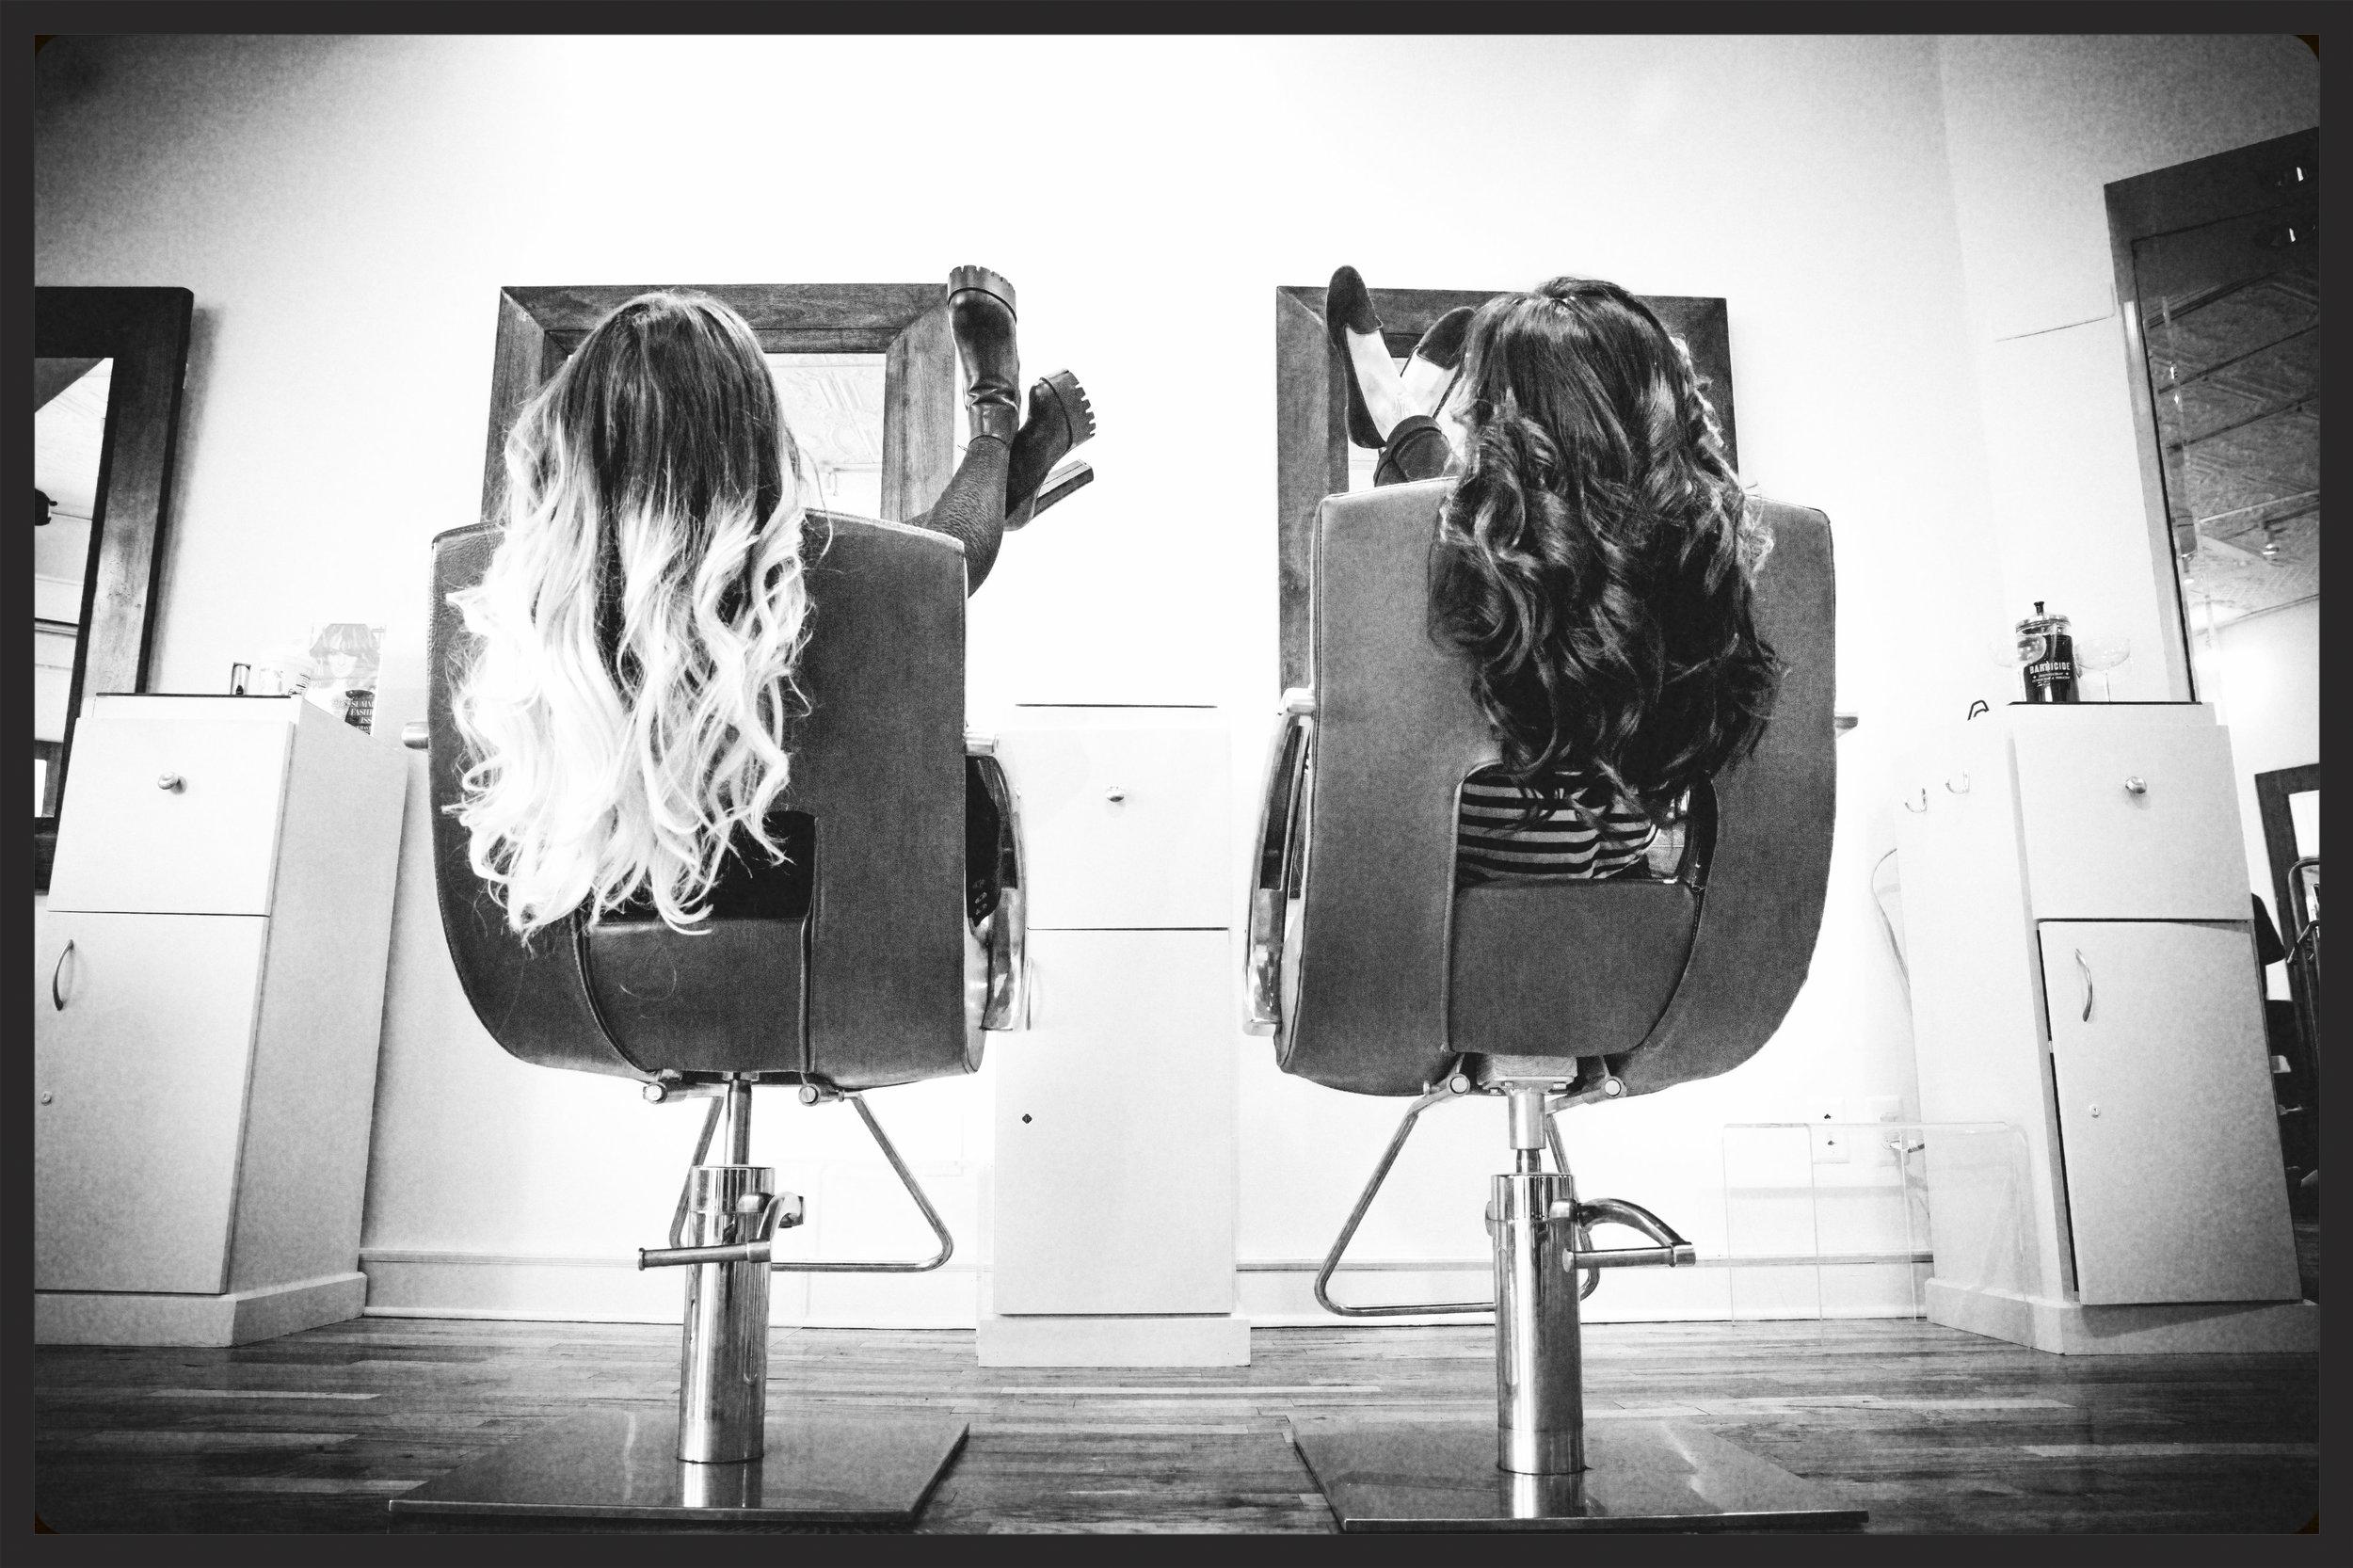 hair - black and white edit.jpg